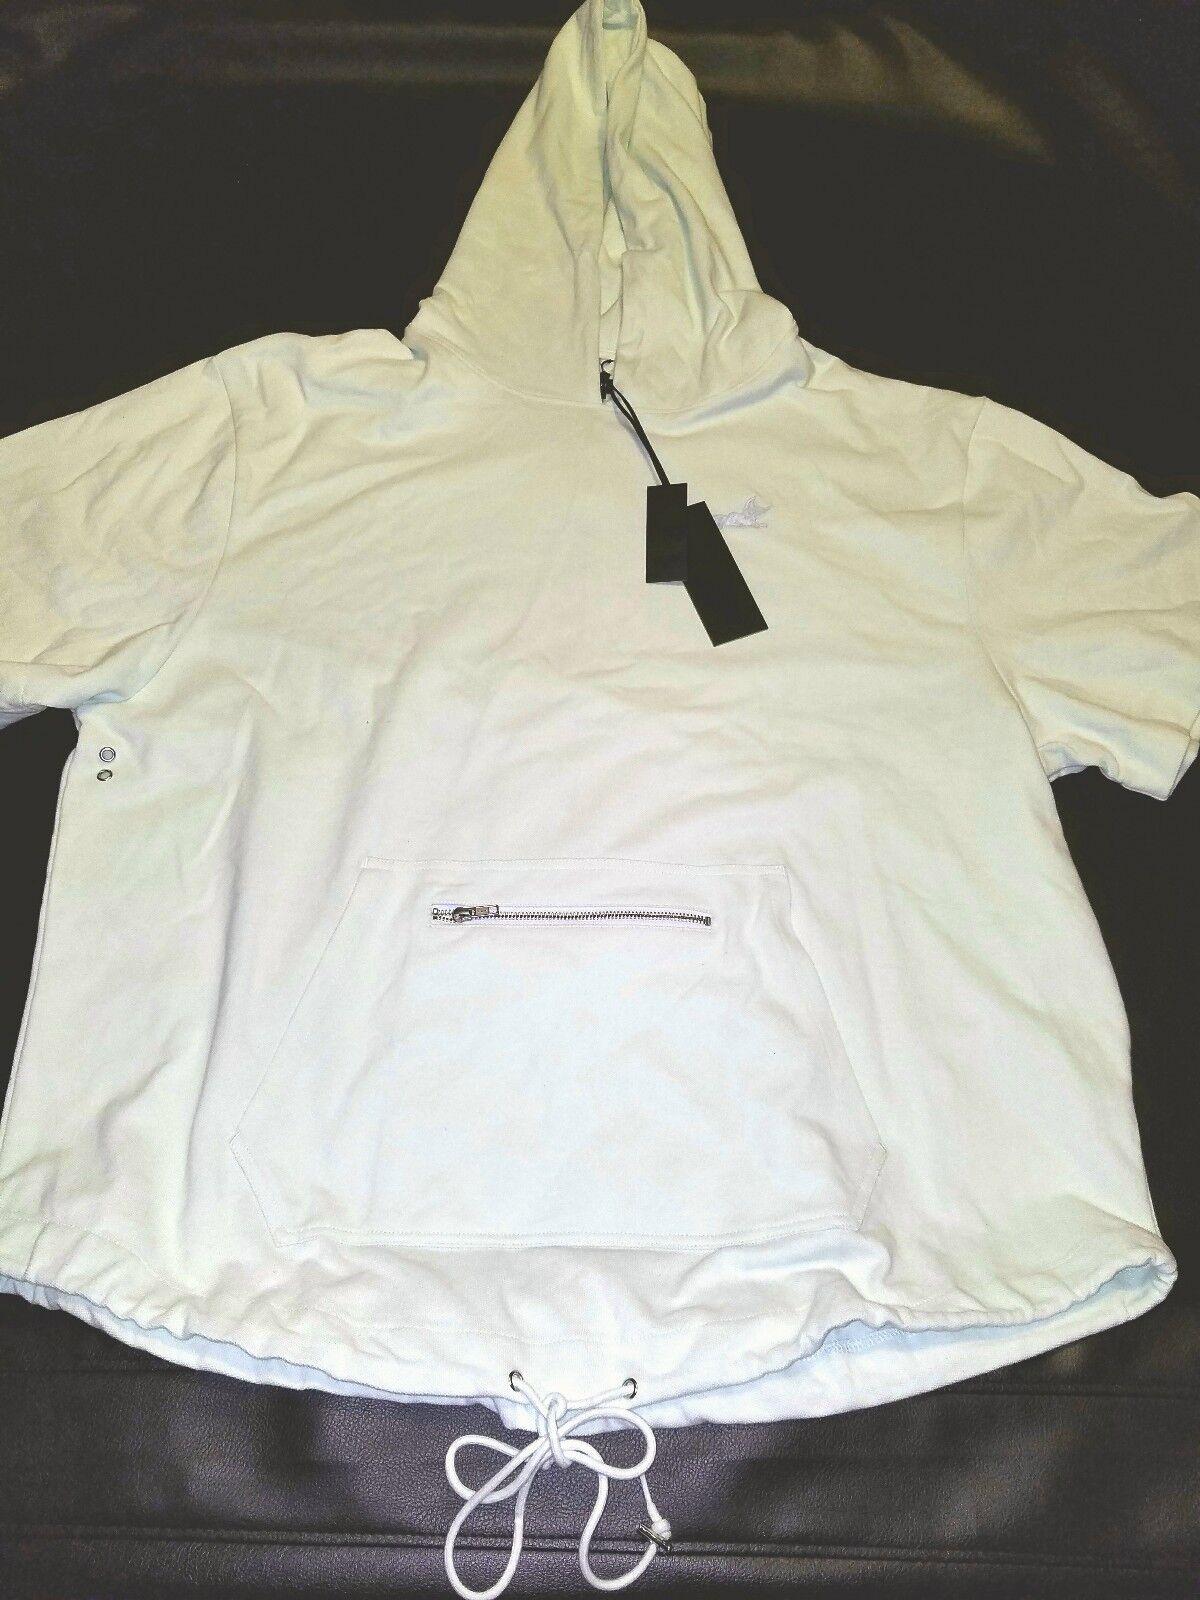 Brand new 2XL Lime Grün Akoo Hoodie w/tags. MSRP 78 Great buy